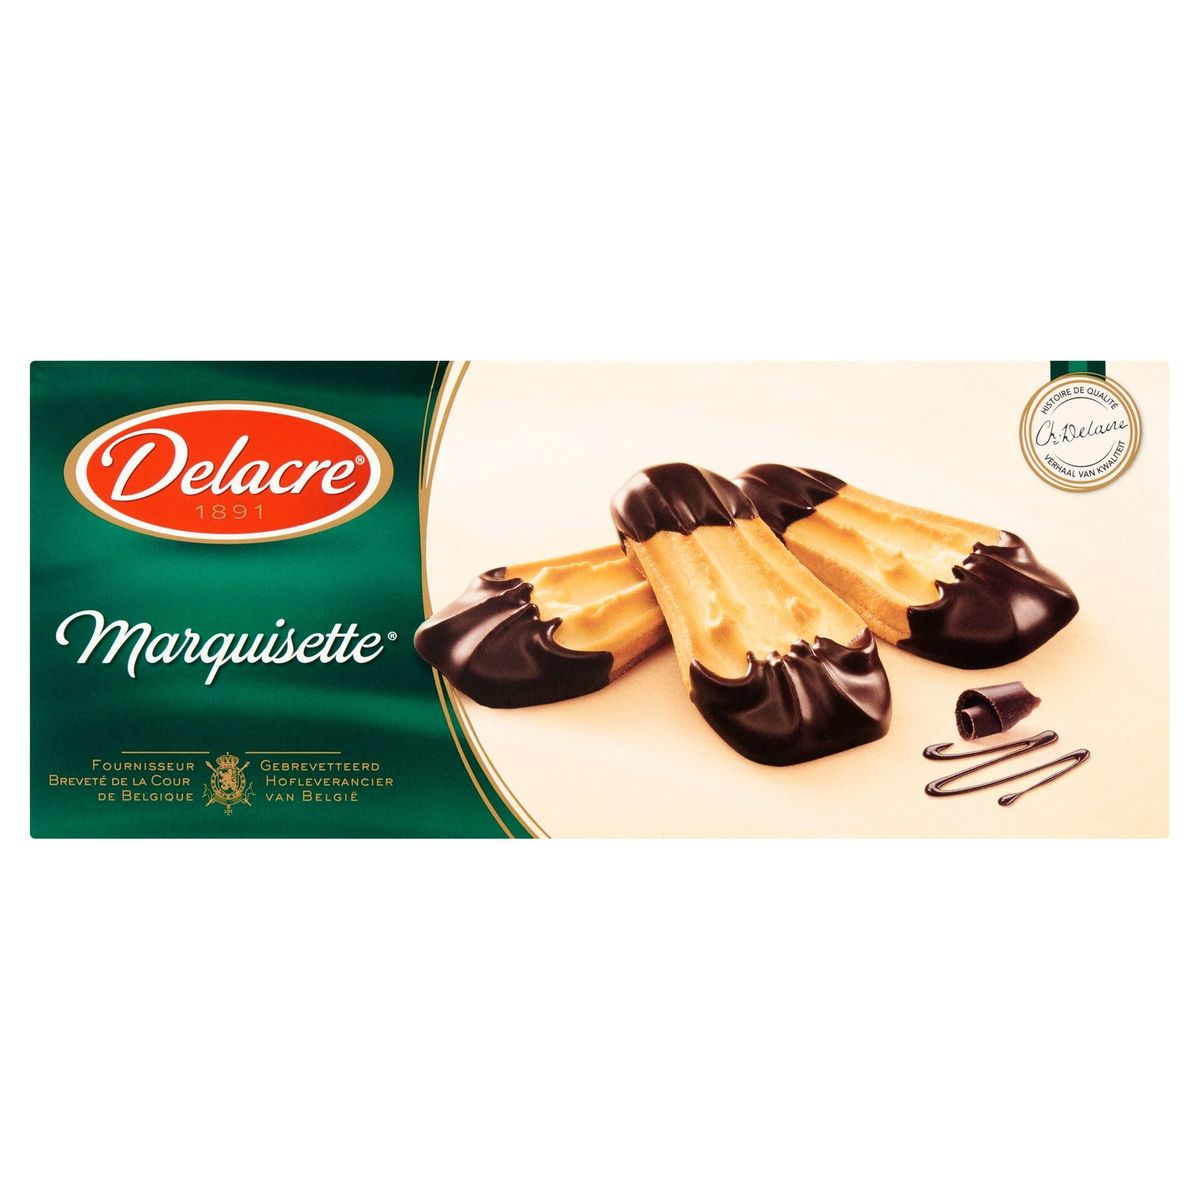 Delacre Marquisette 175 g